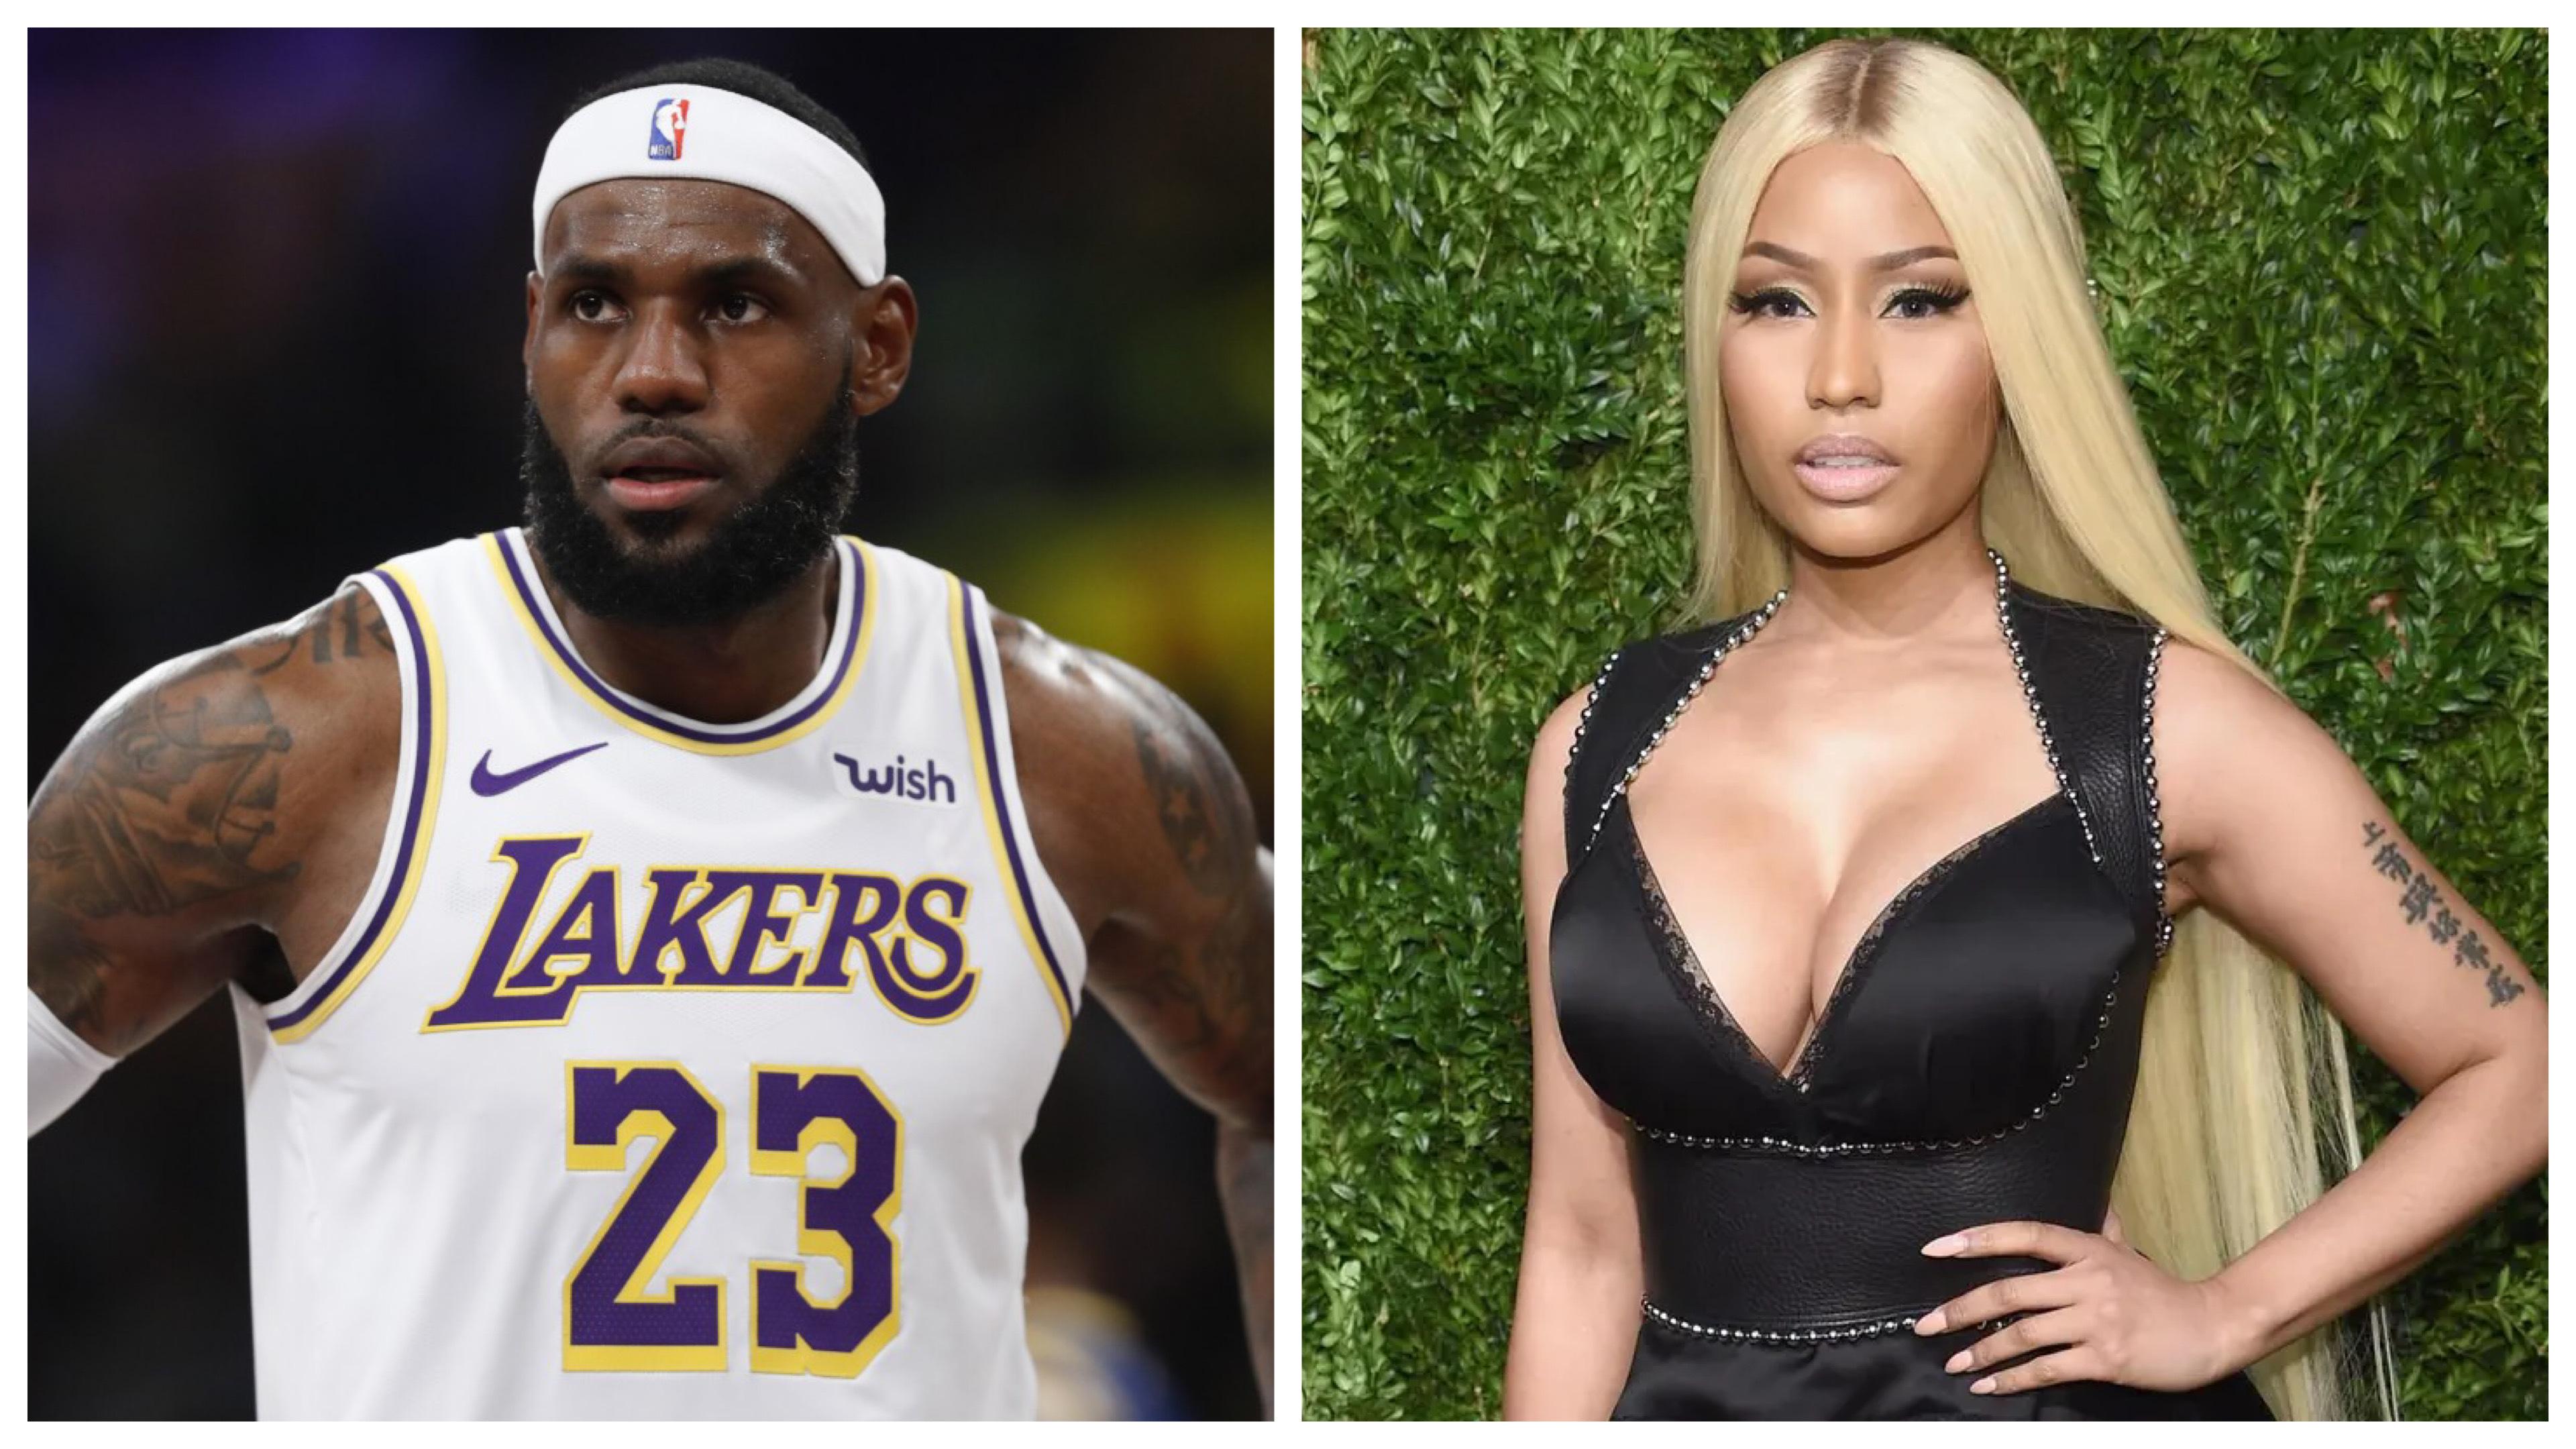 LeBron James and Nicki Minaj